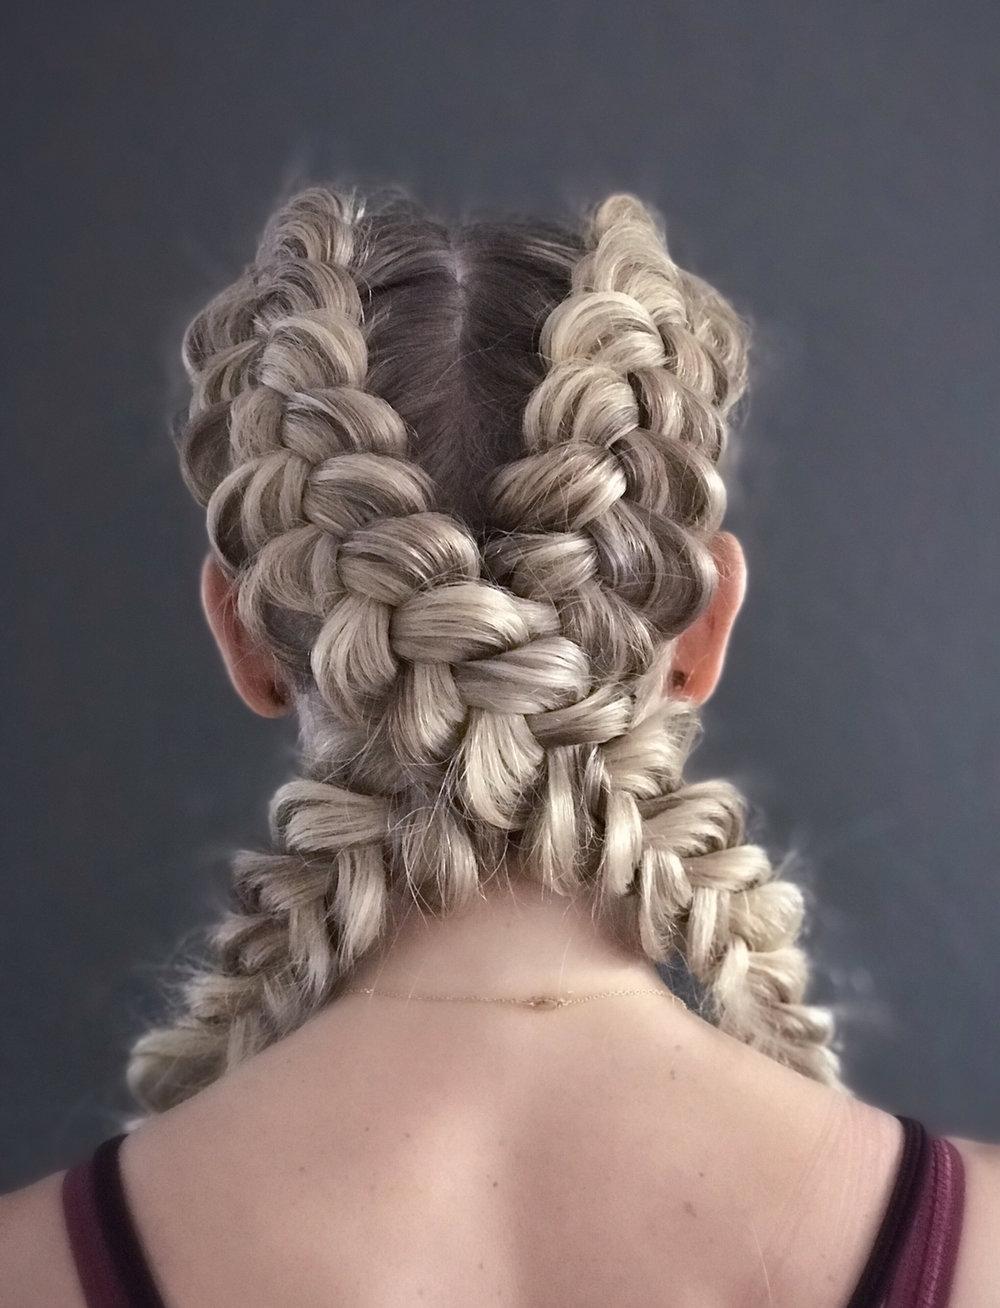 Shapeup convention, gym braids.